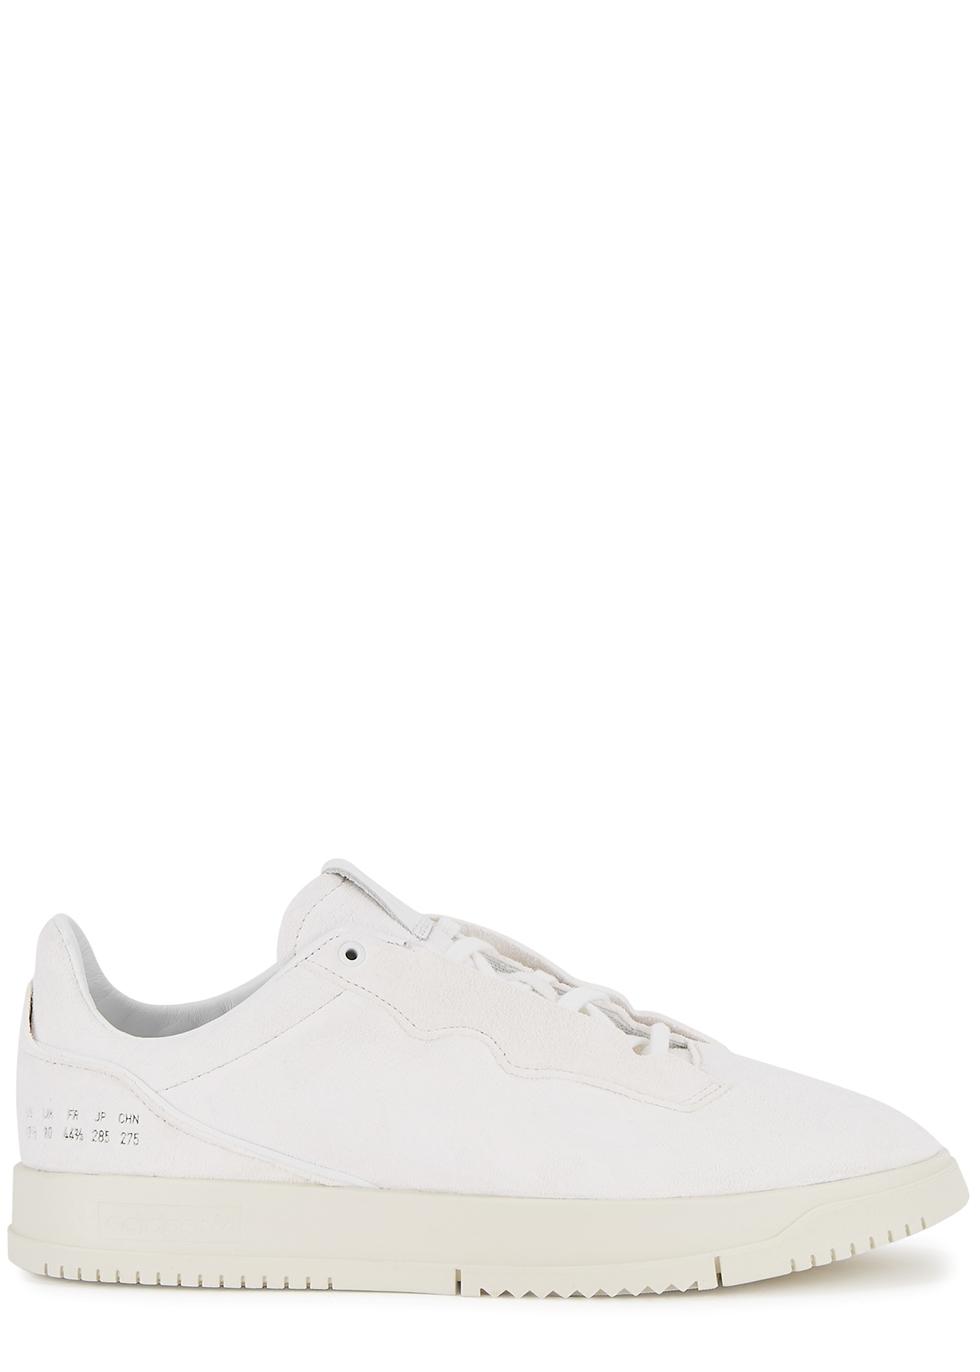 Supercourt Premium white suede sneakers